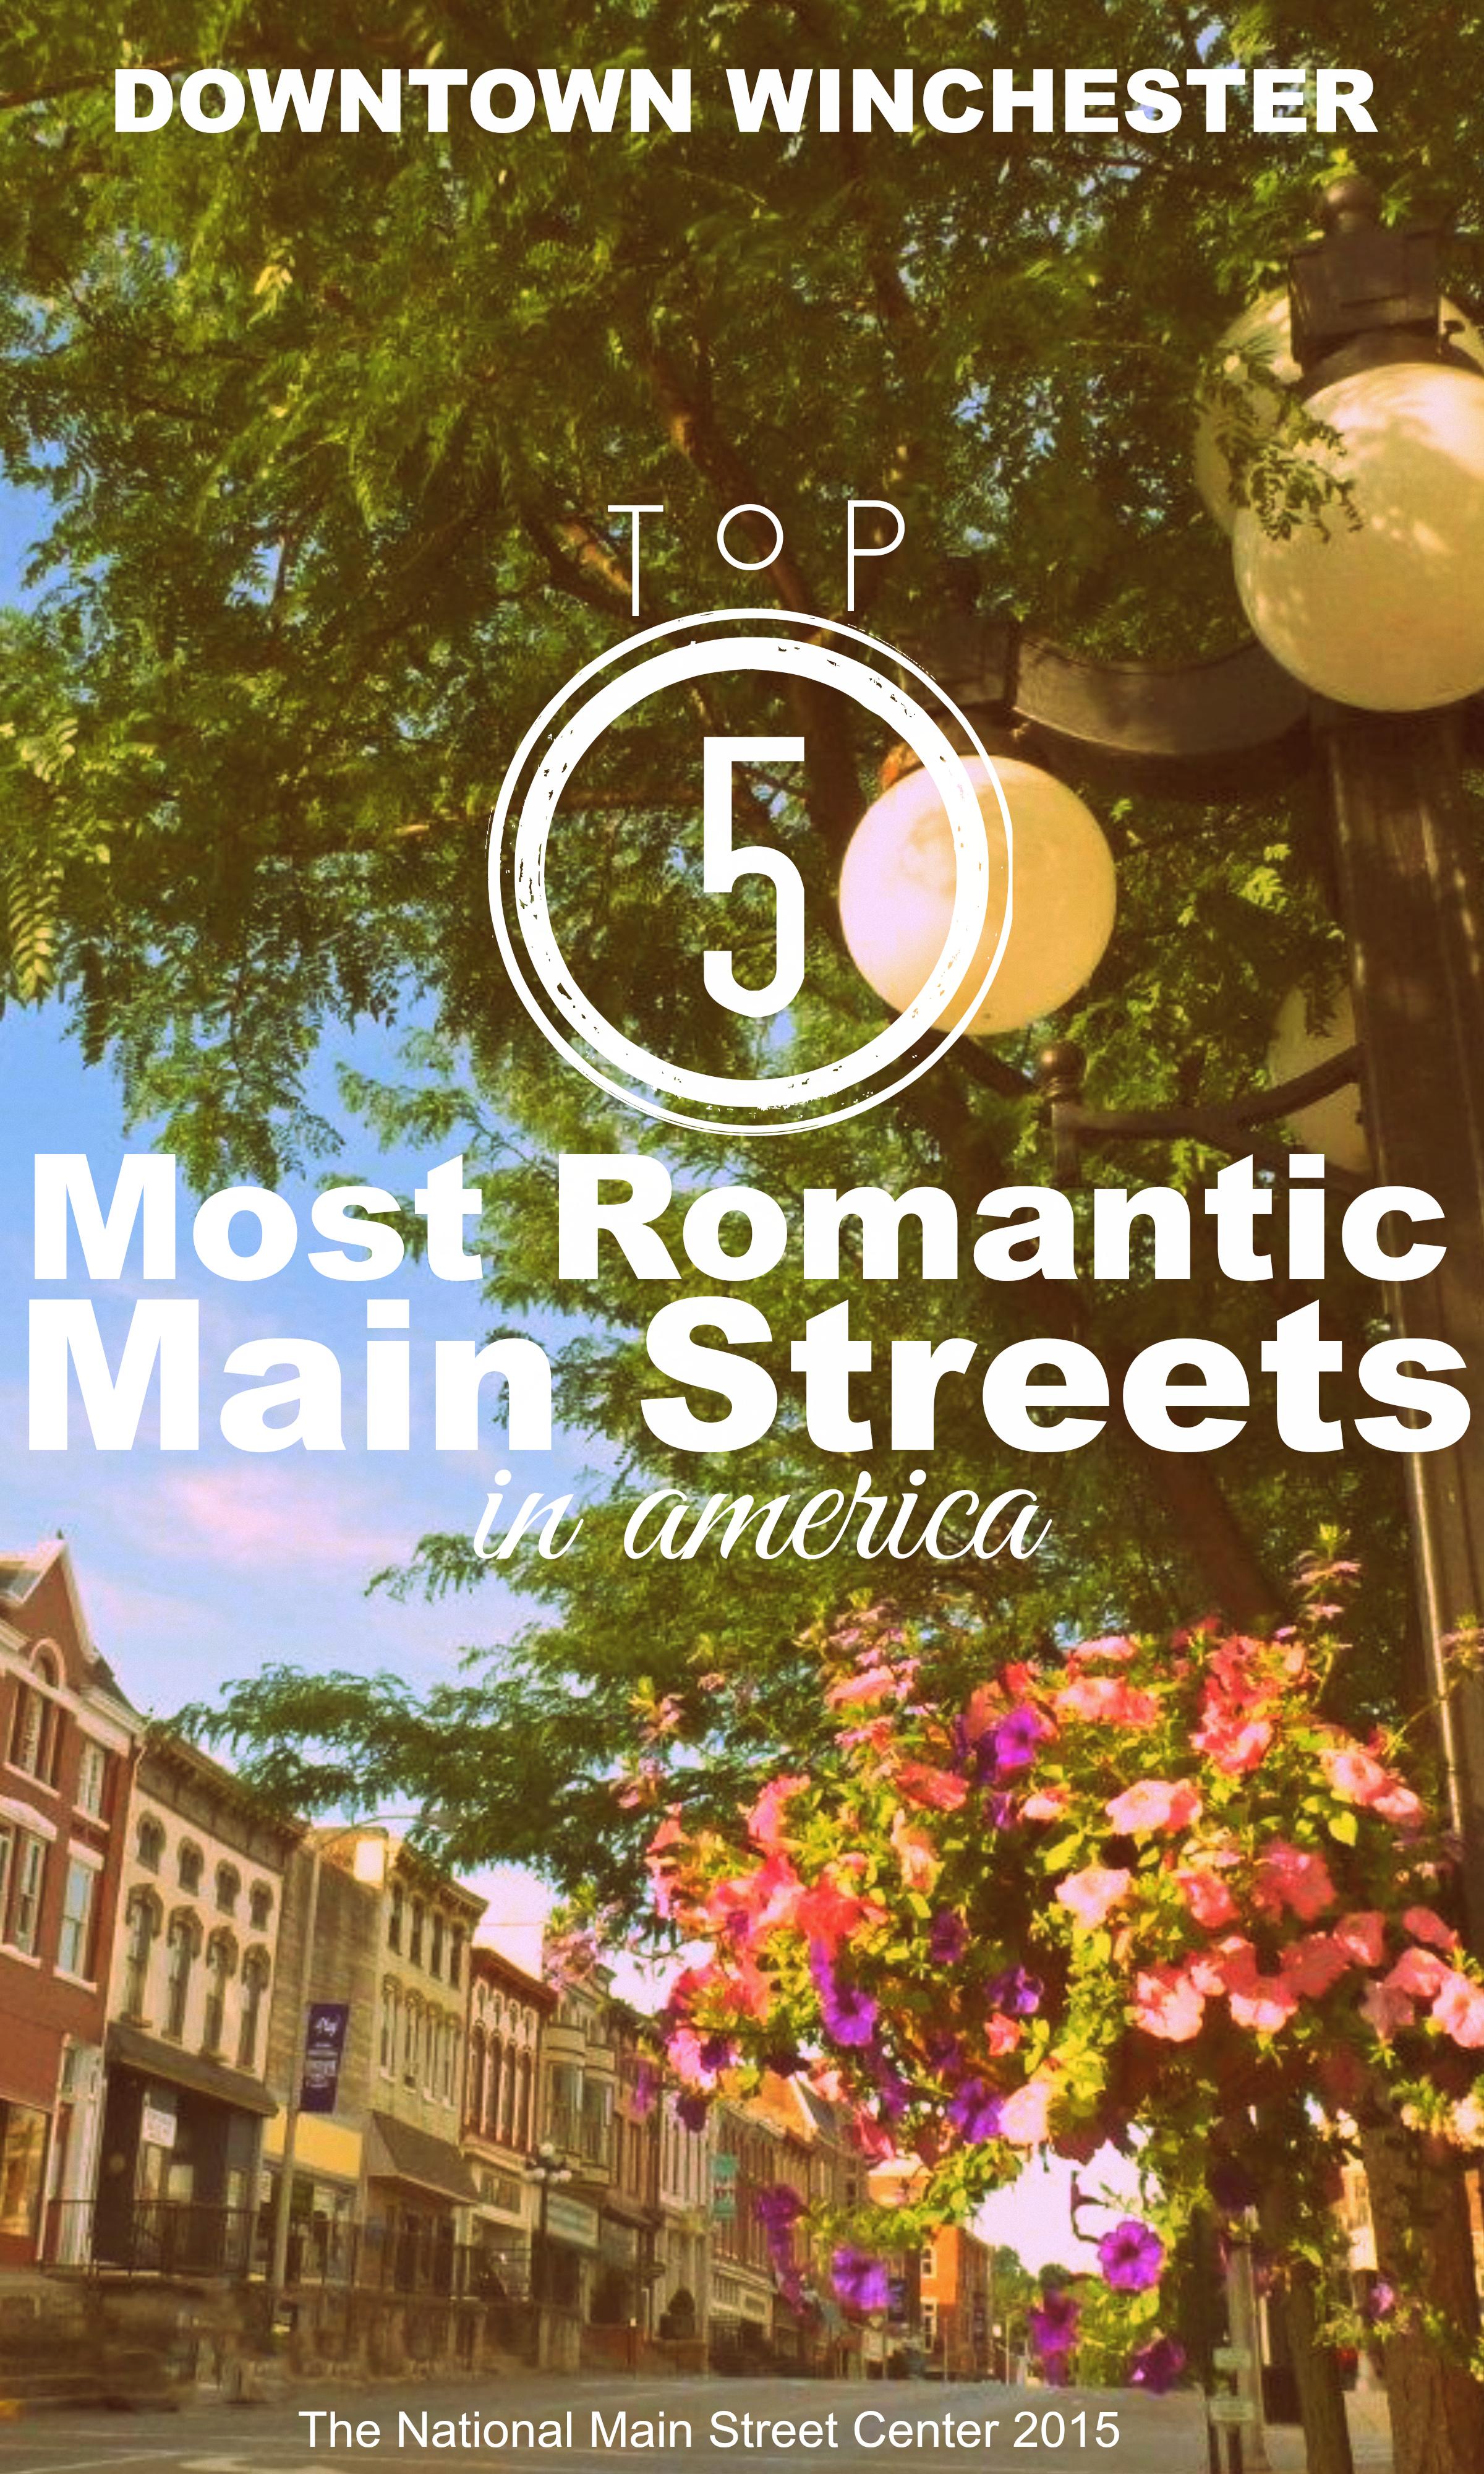 TopFiveMostRomanticMainStreetsPoster.jpg